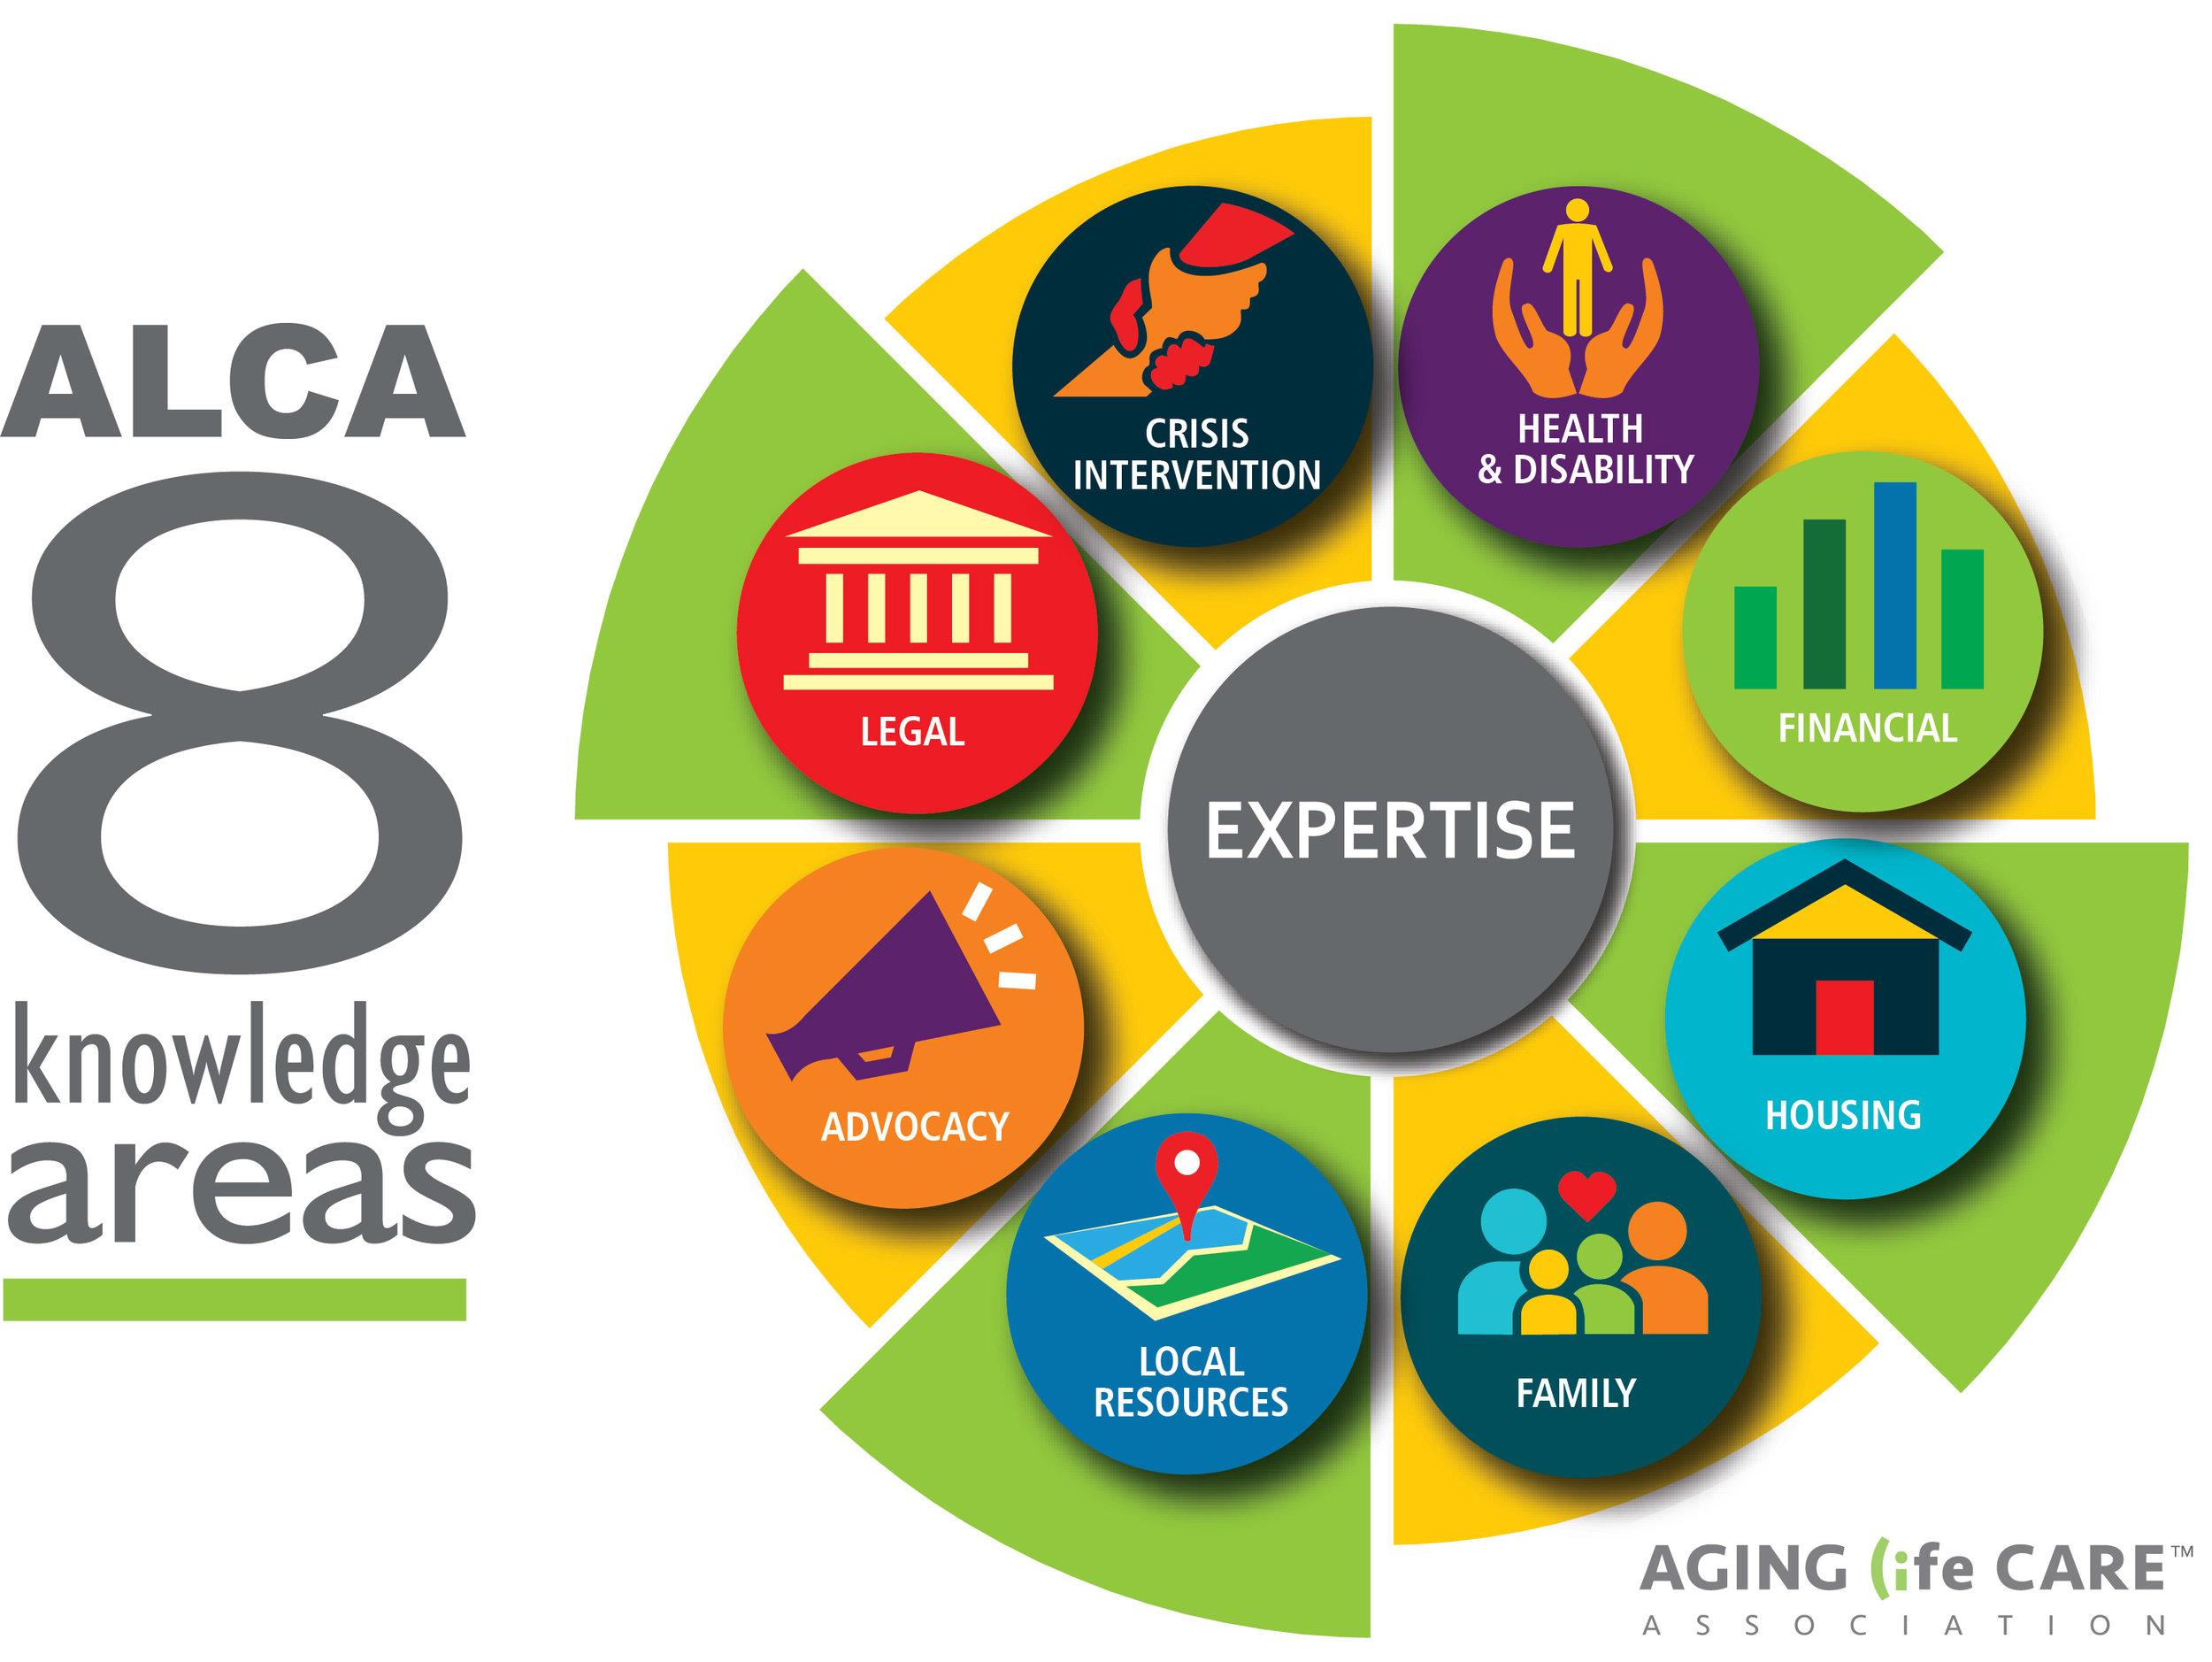 ALCA_Infographic_OCT2015_FINAL.jpg